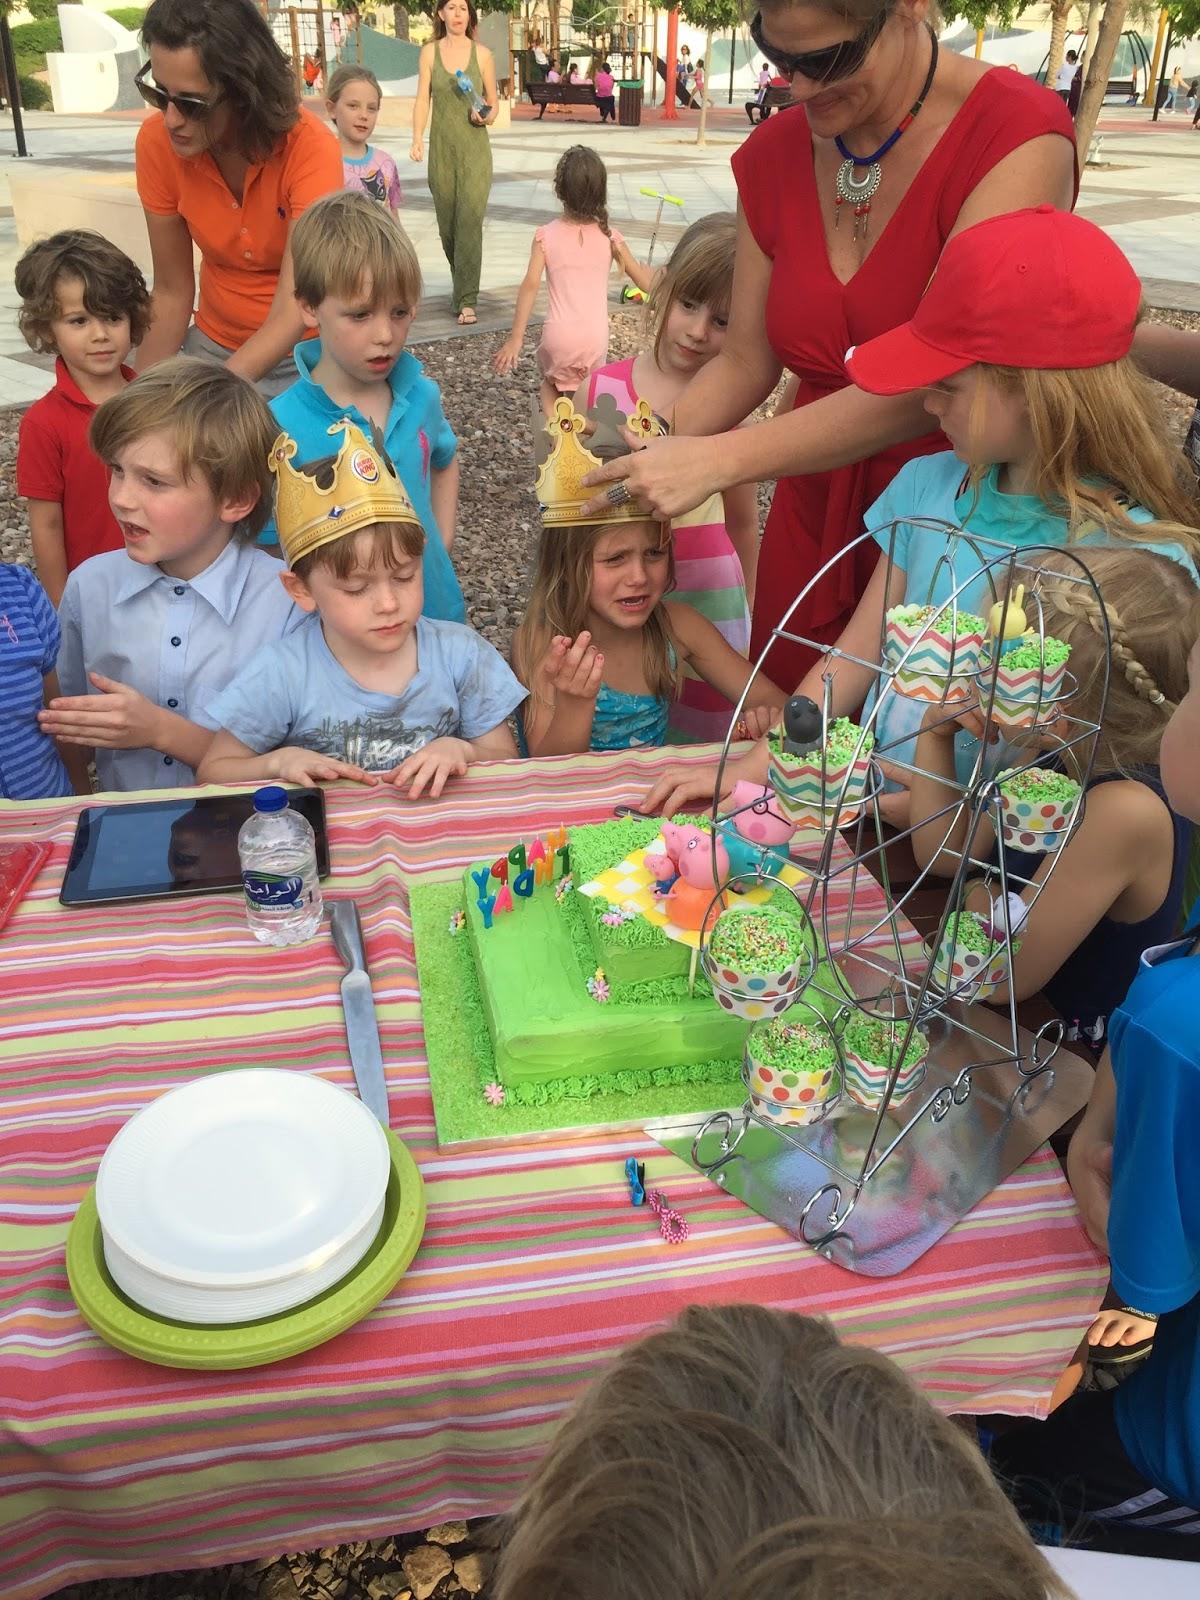 Life In Abu Dhabi Birthday Fun At The Splash Park